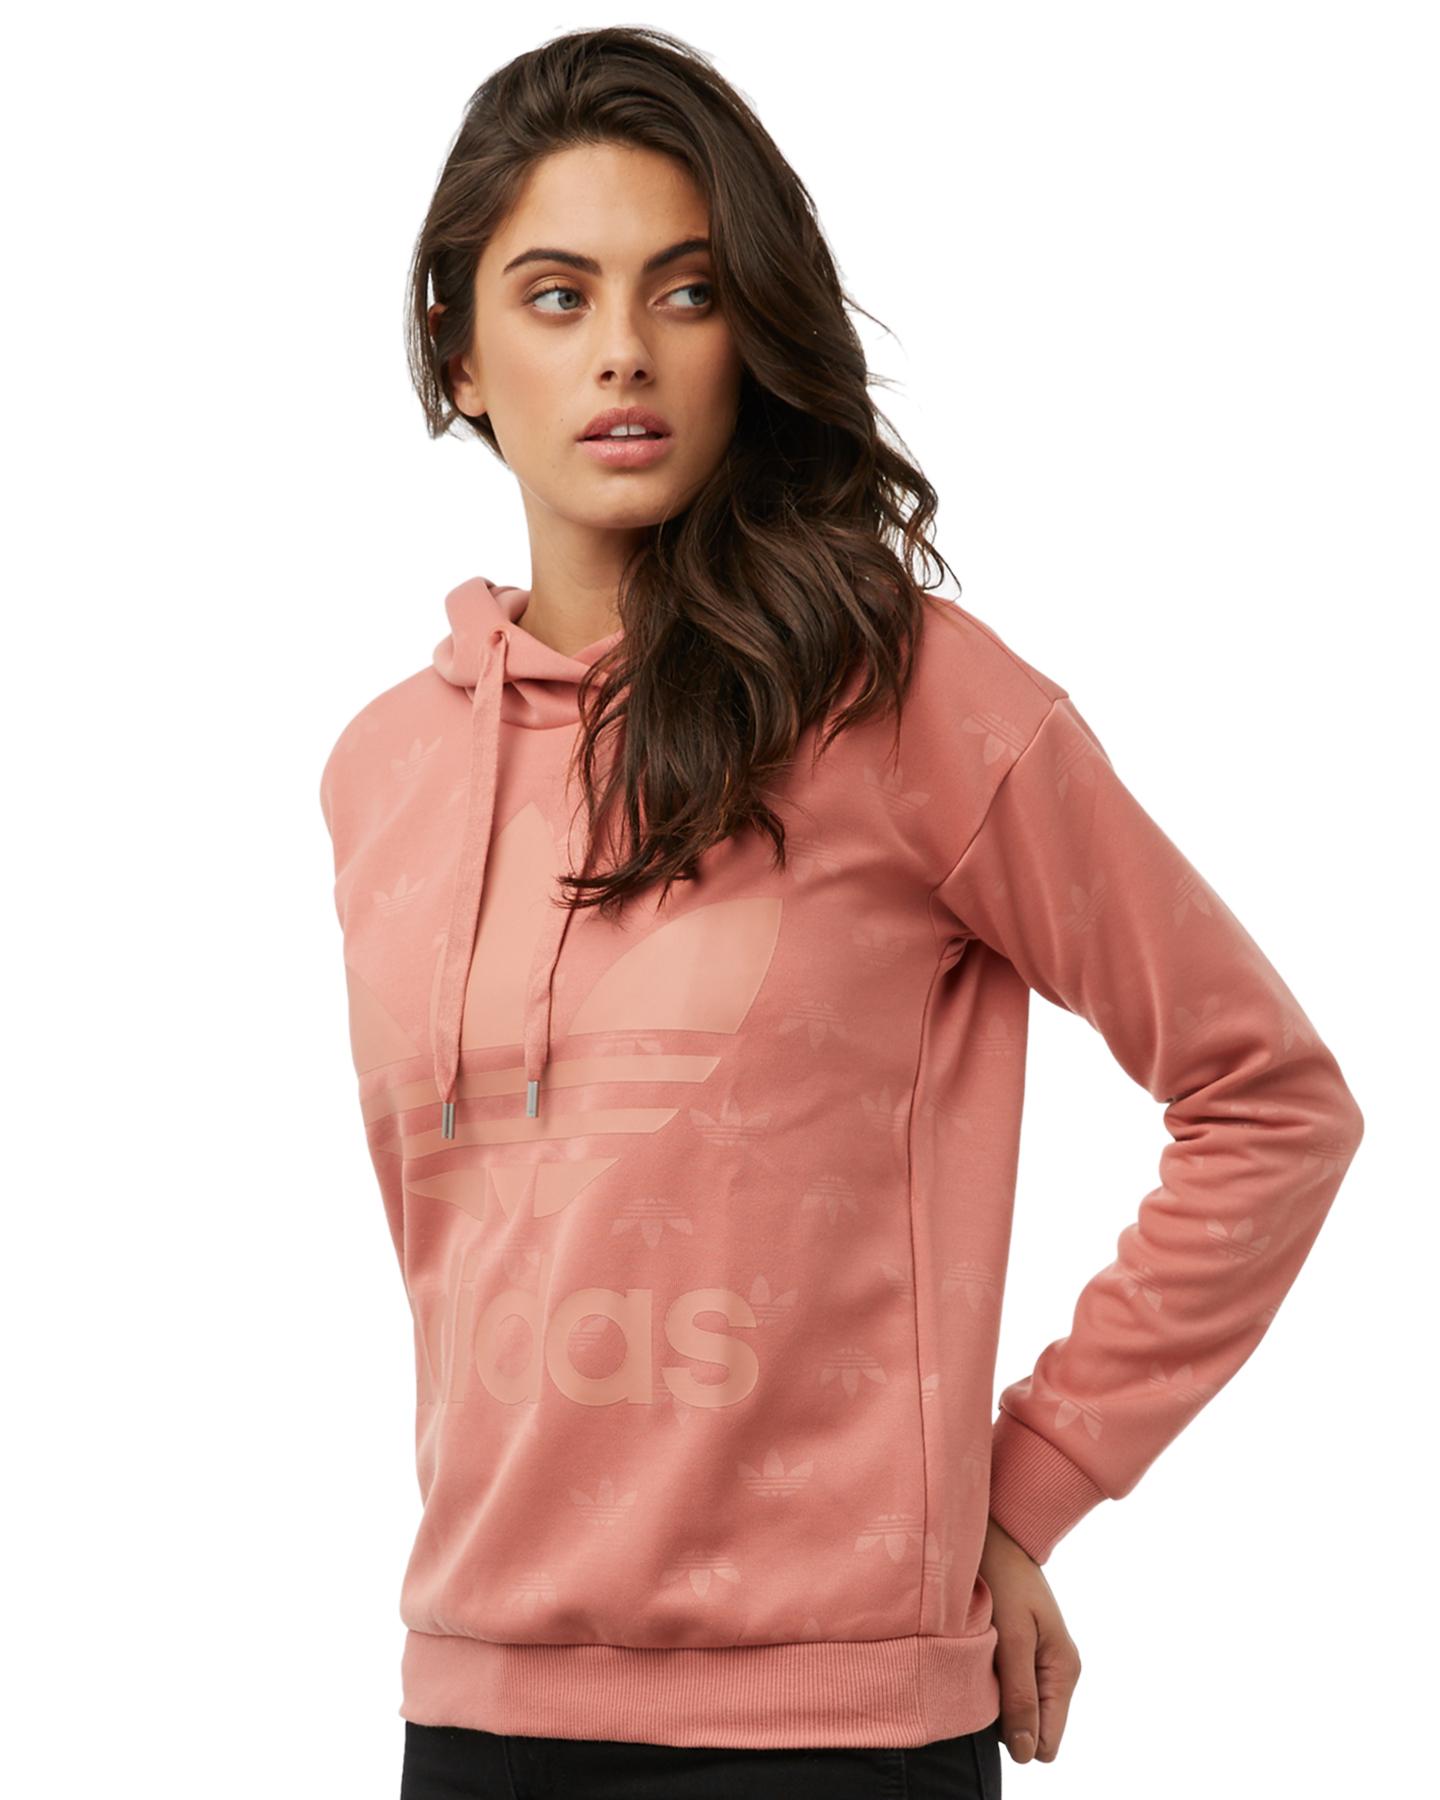 Adidas Originals Ash Pink Sweatshirt - raveitsafe